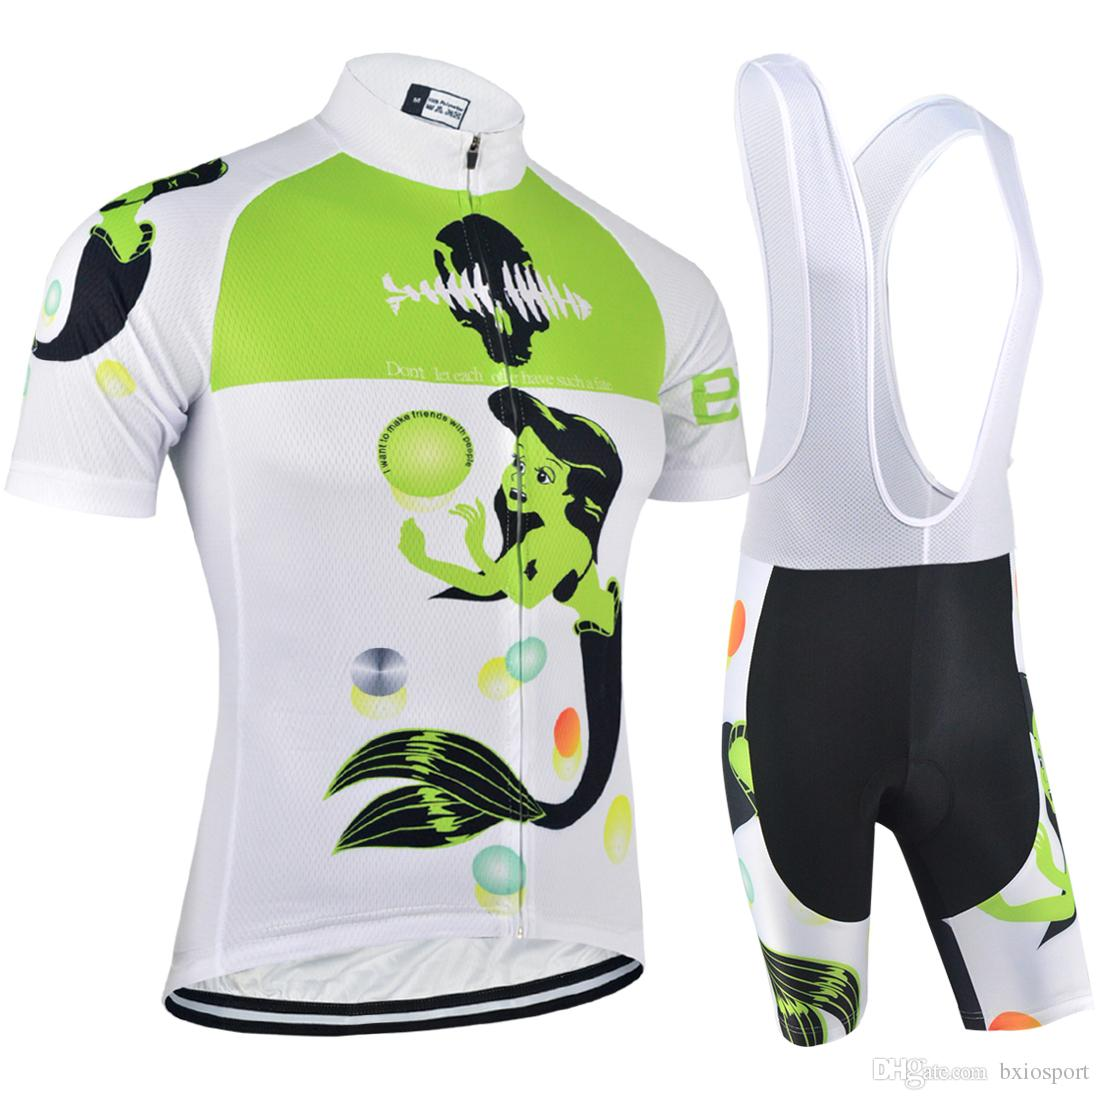 BXIO Brand Cycling Jerseys New Short Sleeve Mountain Bike Clothing ... 9acfe589f